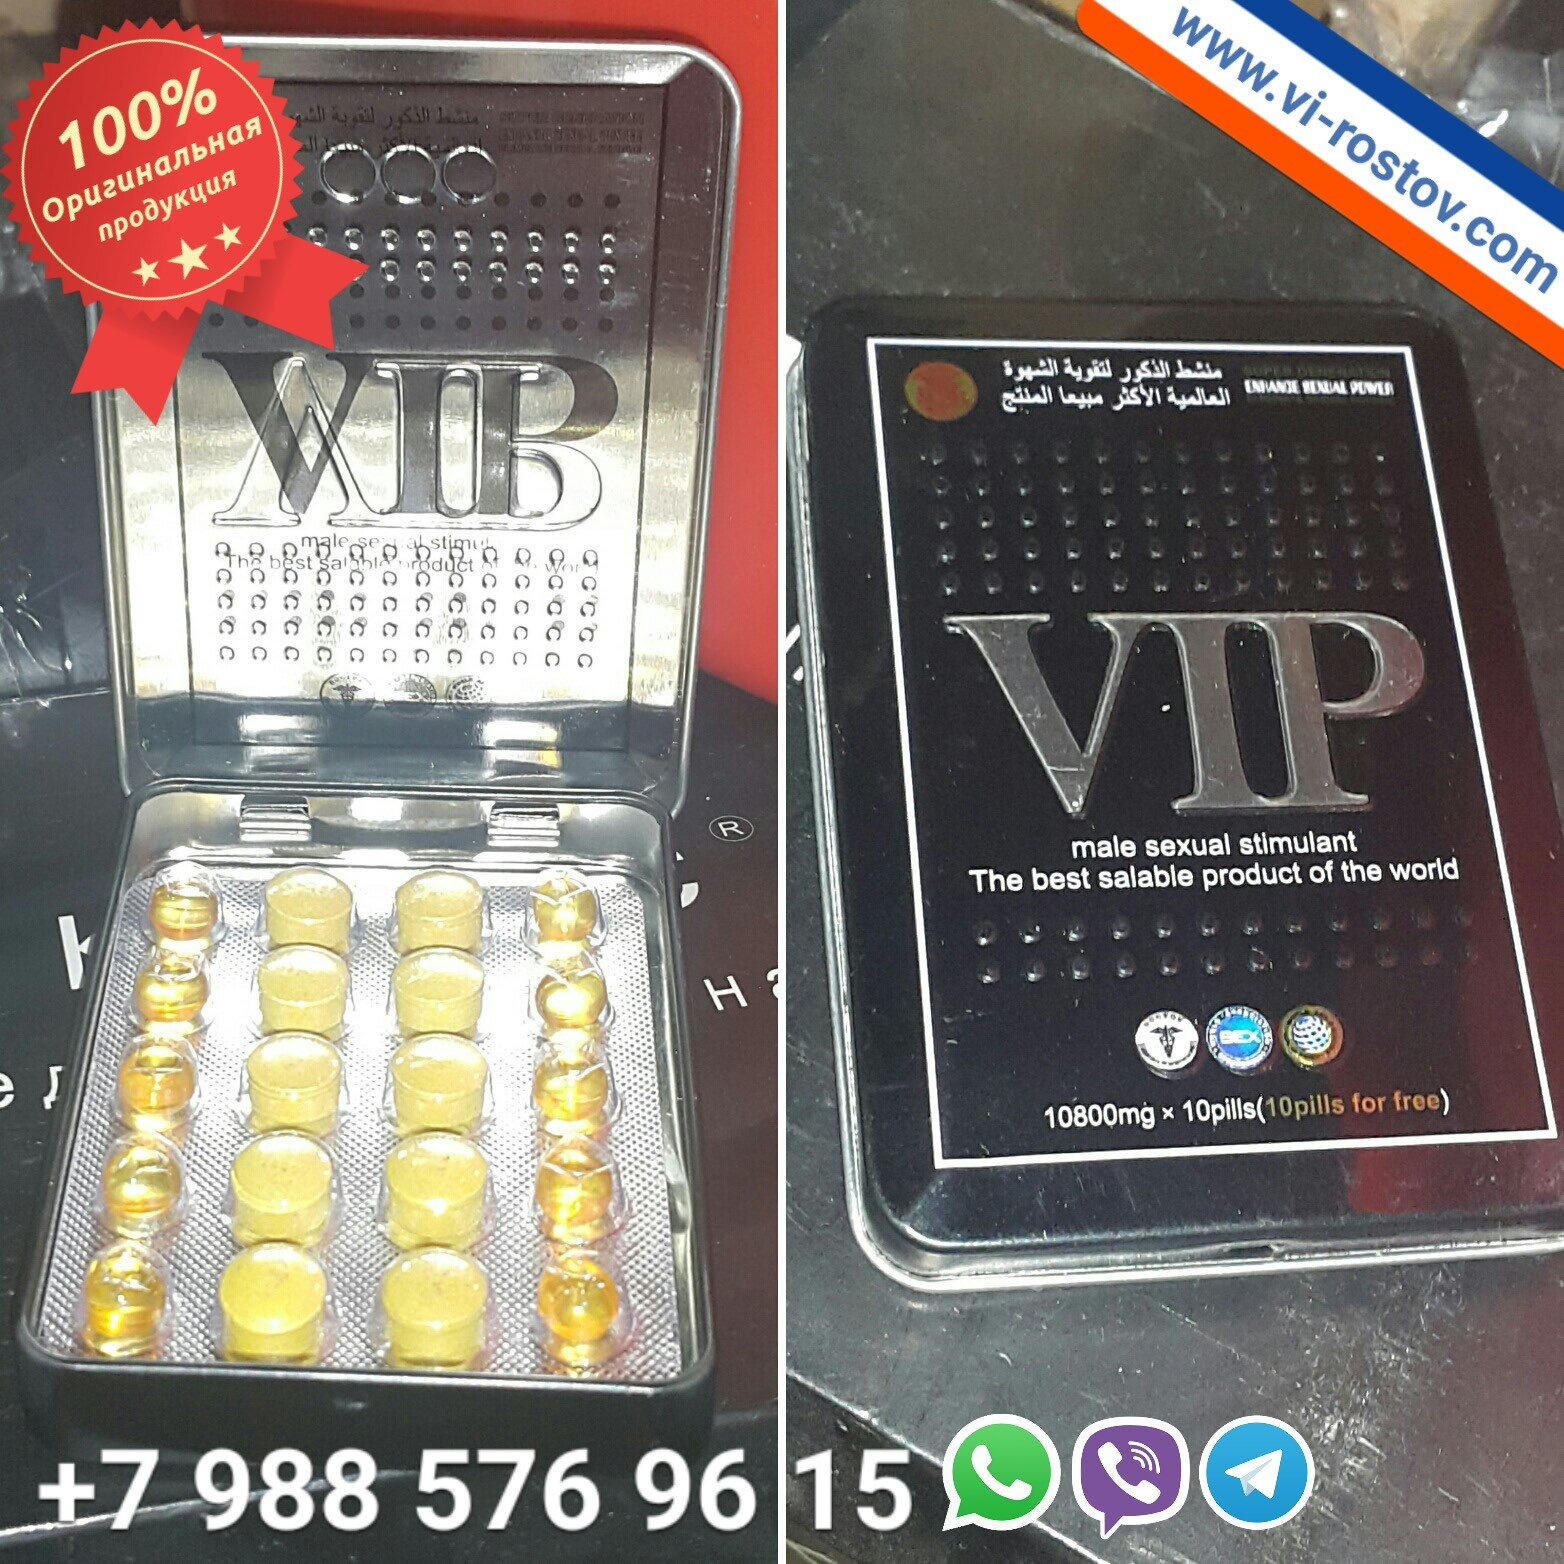 VIP-ВИП-натуральный препарат для мужчин 10 таблеток - фото pic_59b8bd63b4df04f9763fe4d55369e9c8_1920x9000_1.jpg